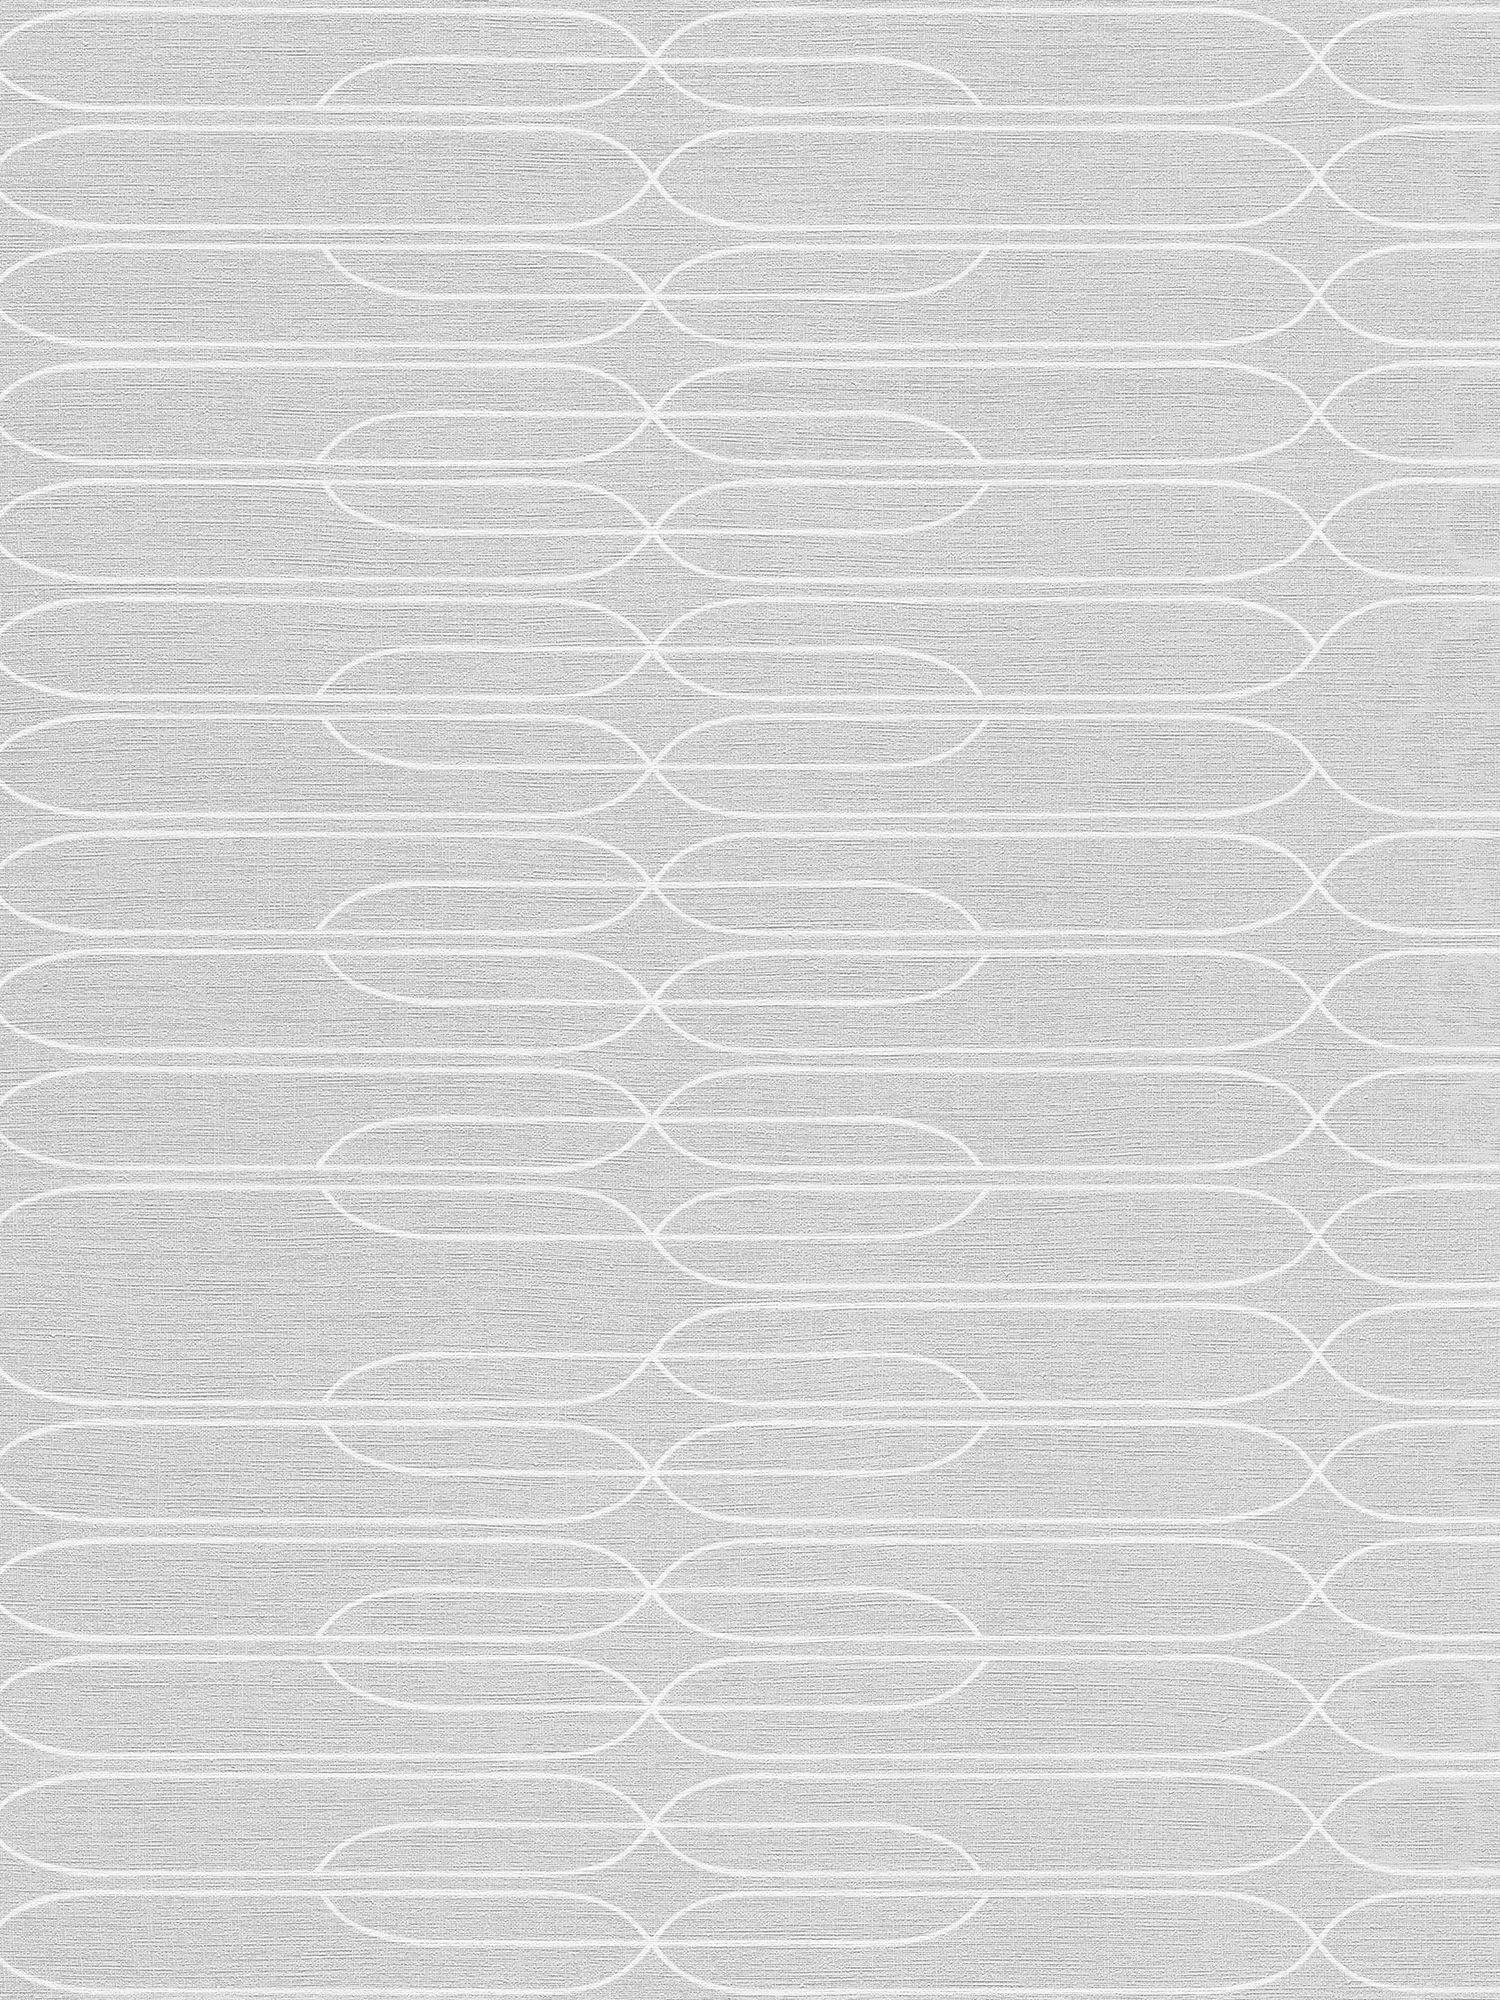 Galerie Galerie Deco Line Print Wallpaper